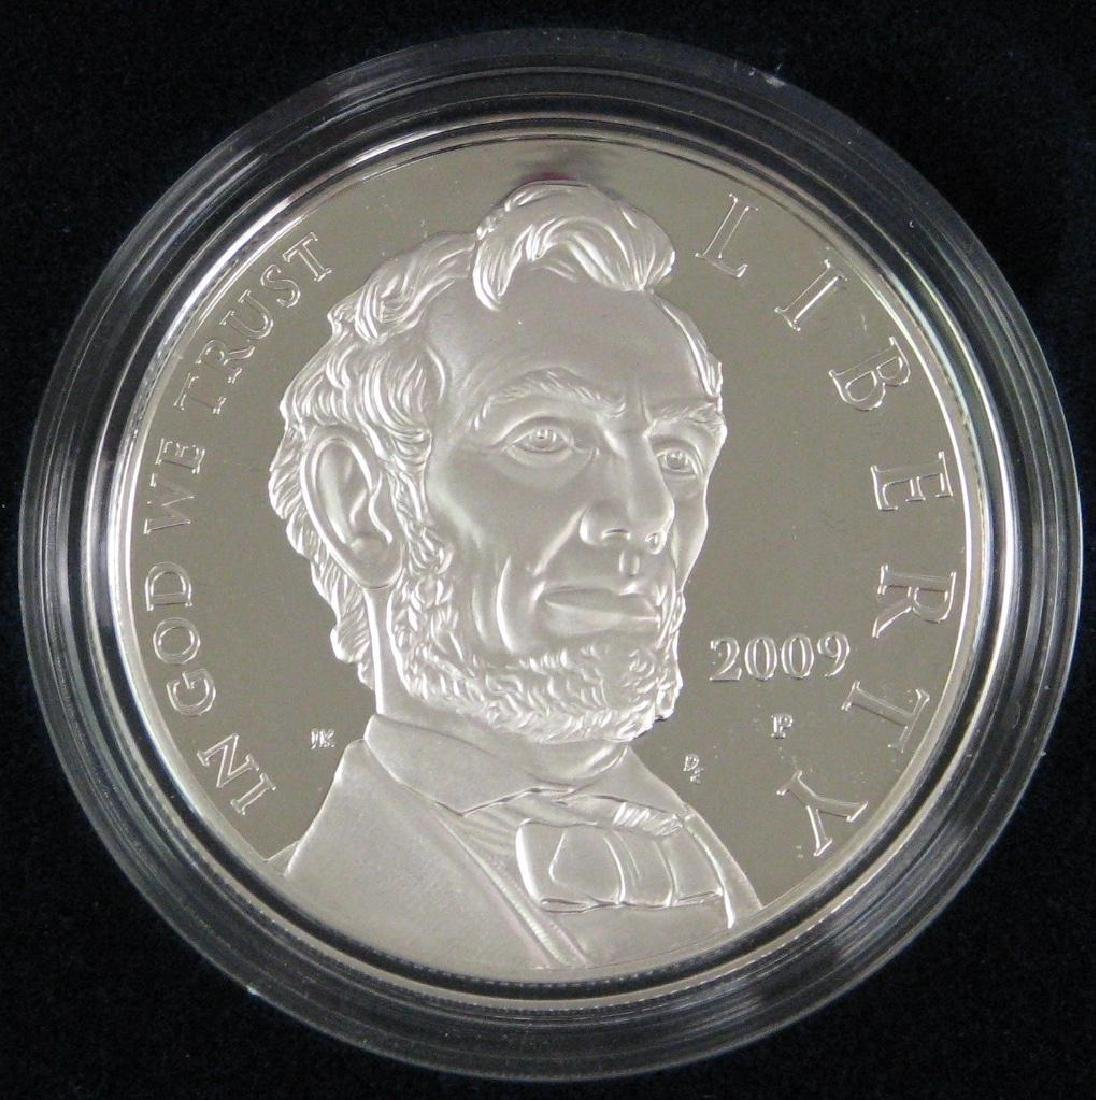 Lot of 2 : 2009-P Lincoln Commemorative Silver Dollars - 3